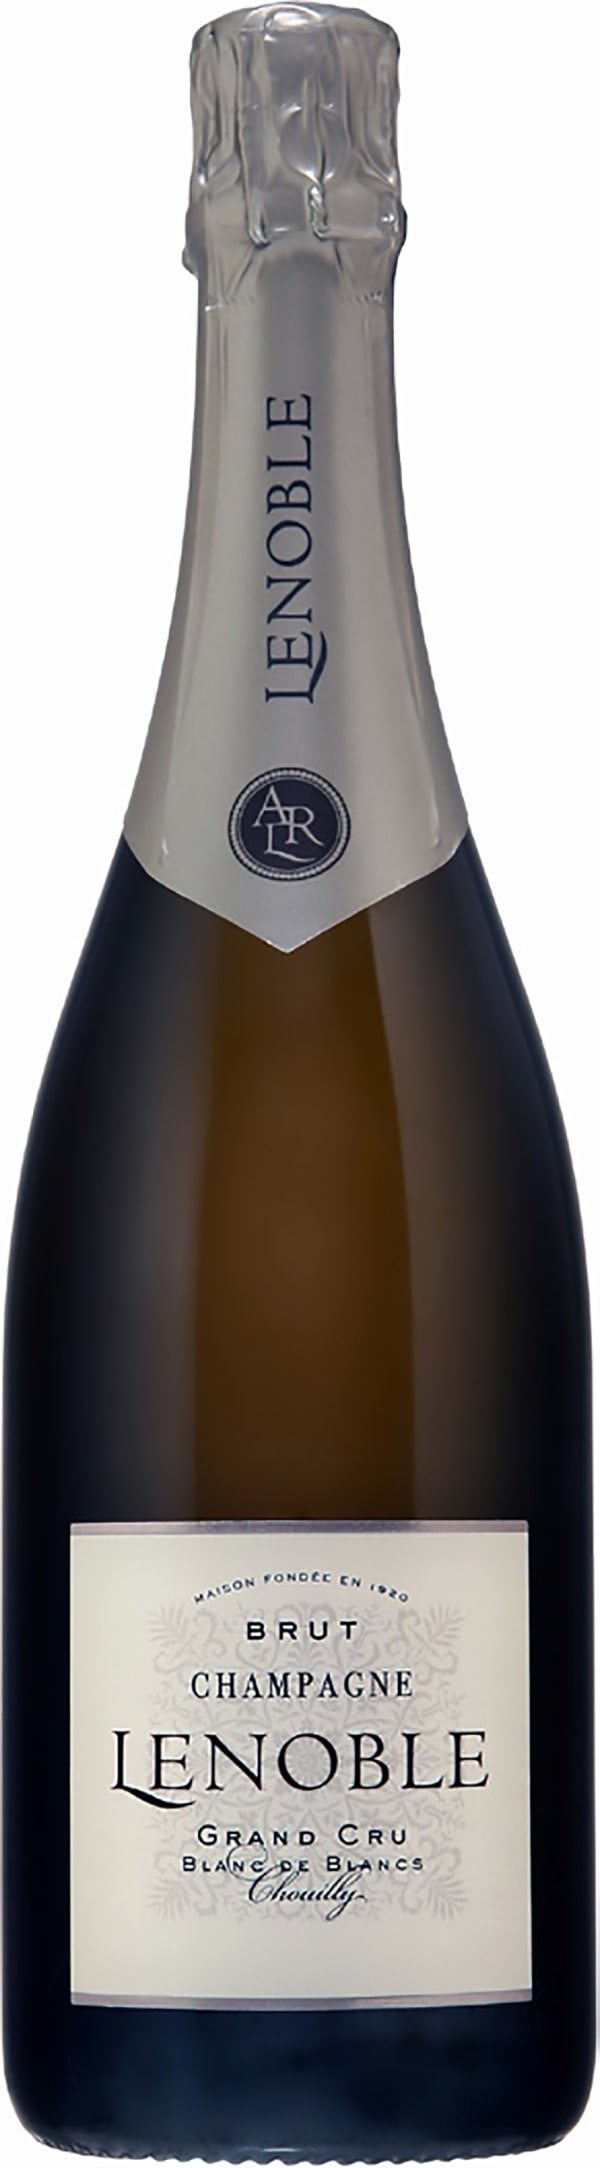 Lenoble Gran Cru Blanc de Blancs Champagne Brut